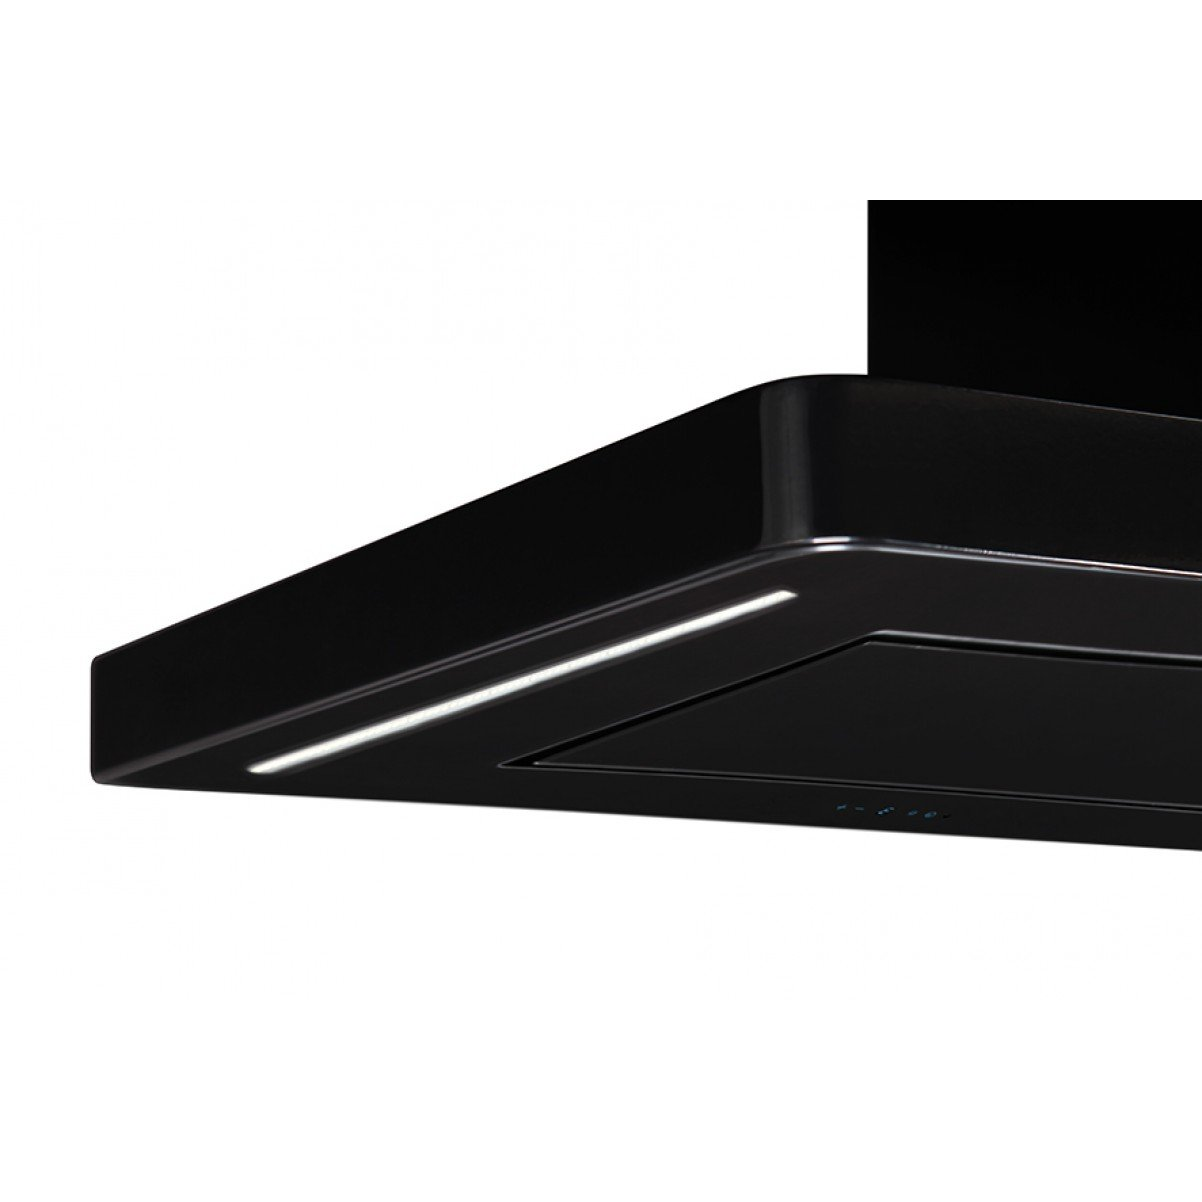 Lyx  frihängande köksfläkt Magnum svart glas 60cm/90cm